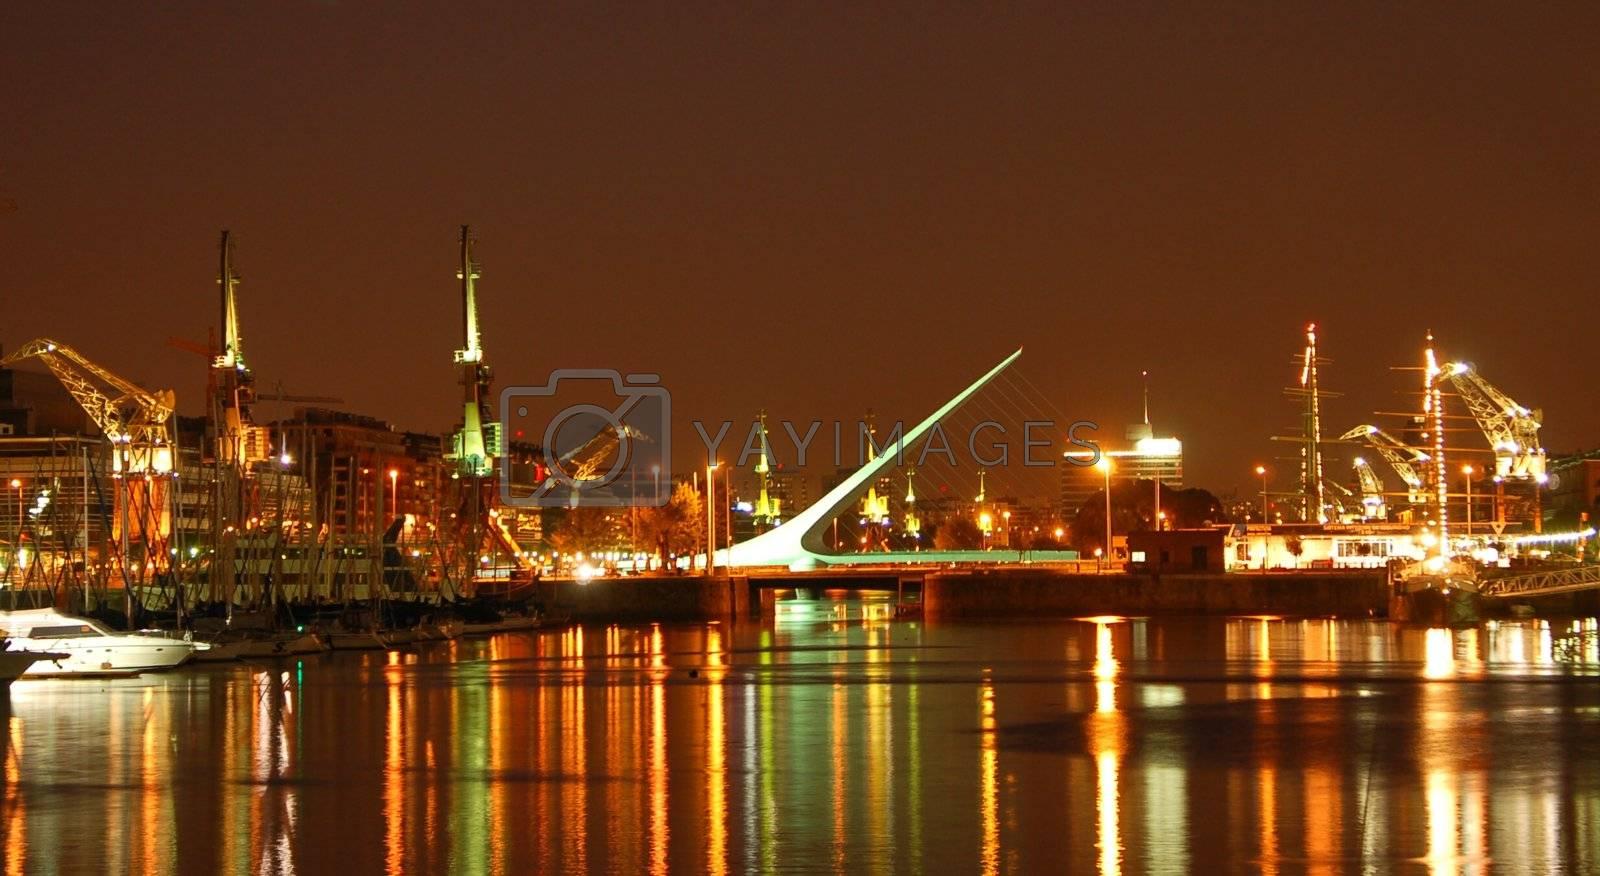 View on illuminated posh Puerto Madero neighbourhood